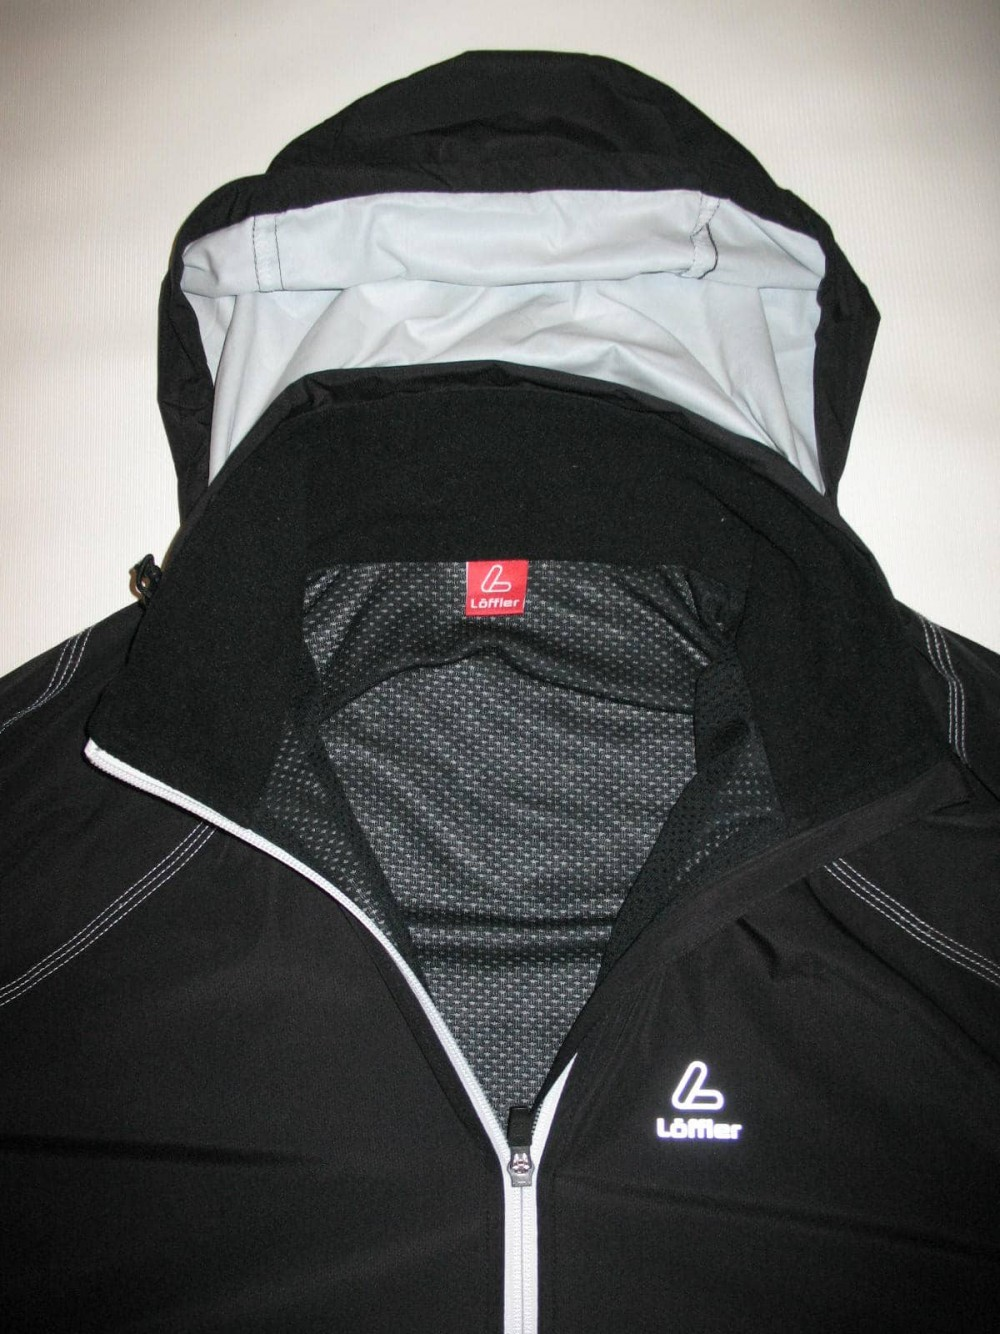 Куртка LOEFFLER windstopper jacket (размер 56/XXL), - 3